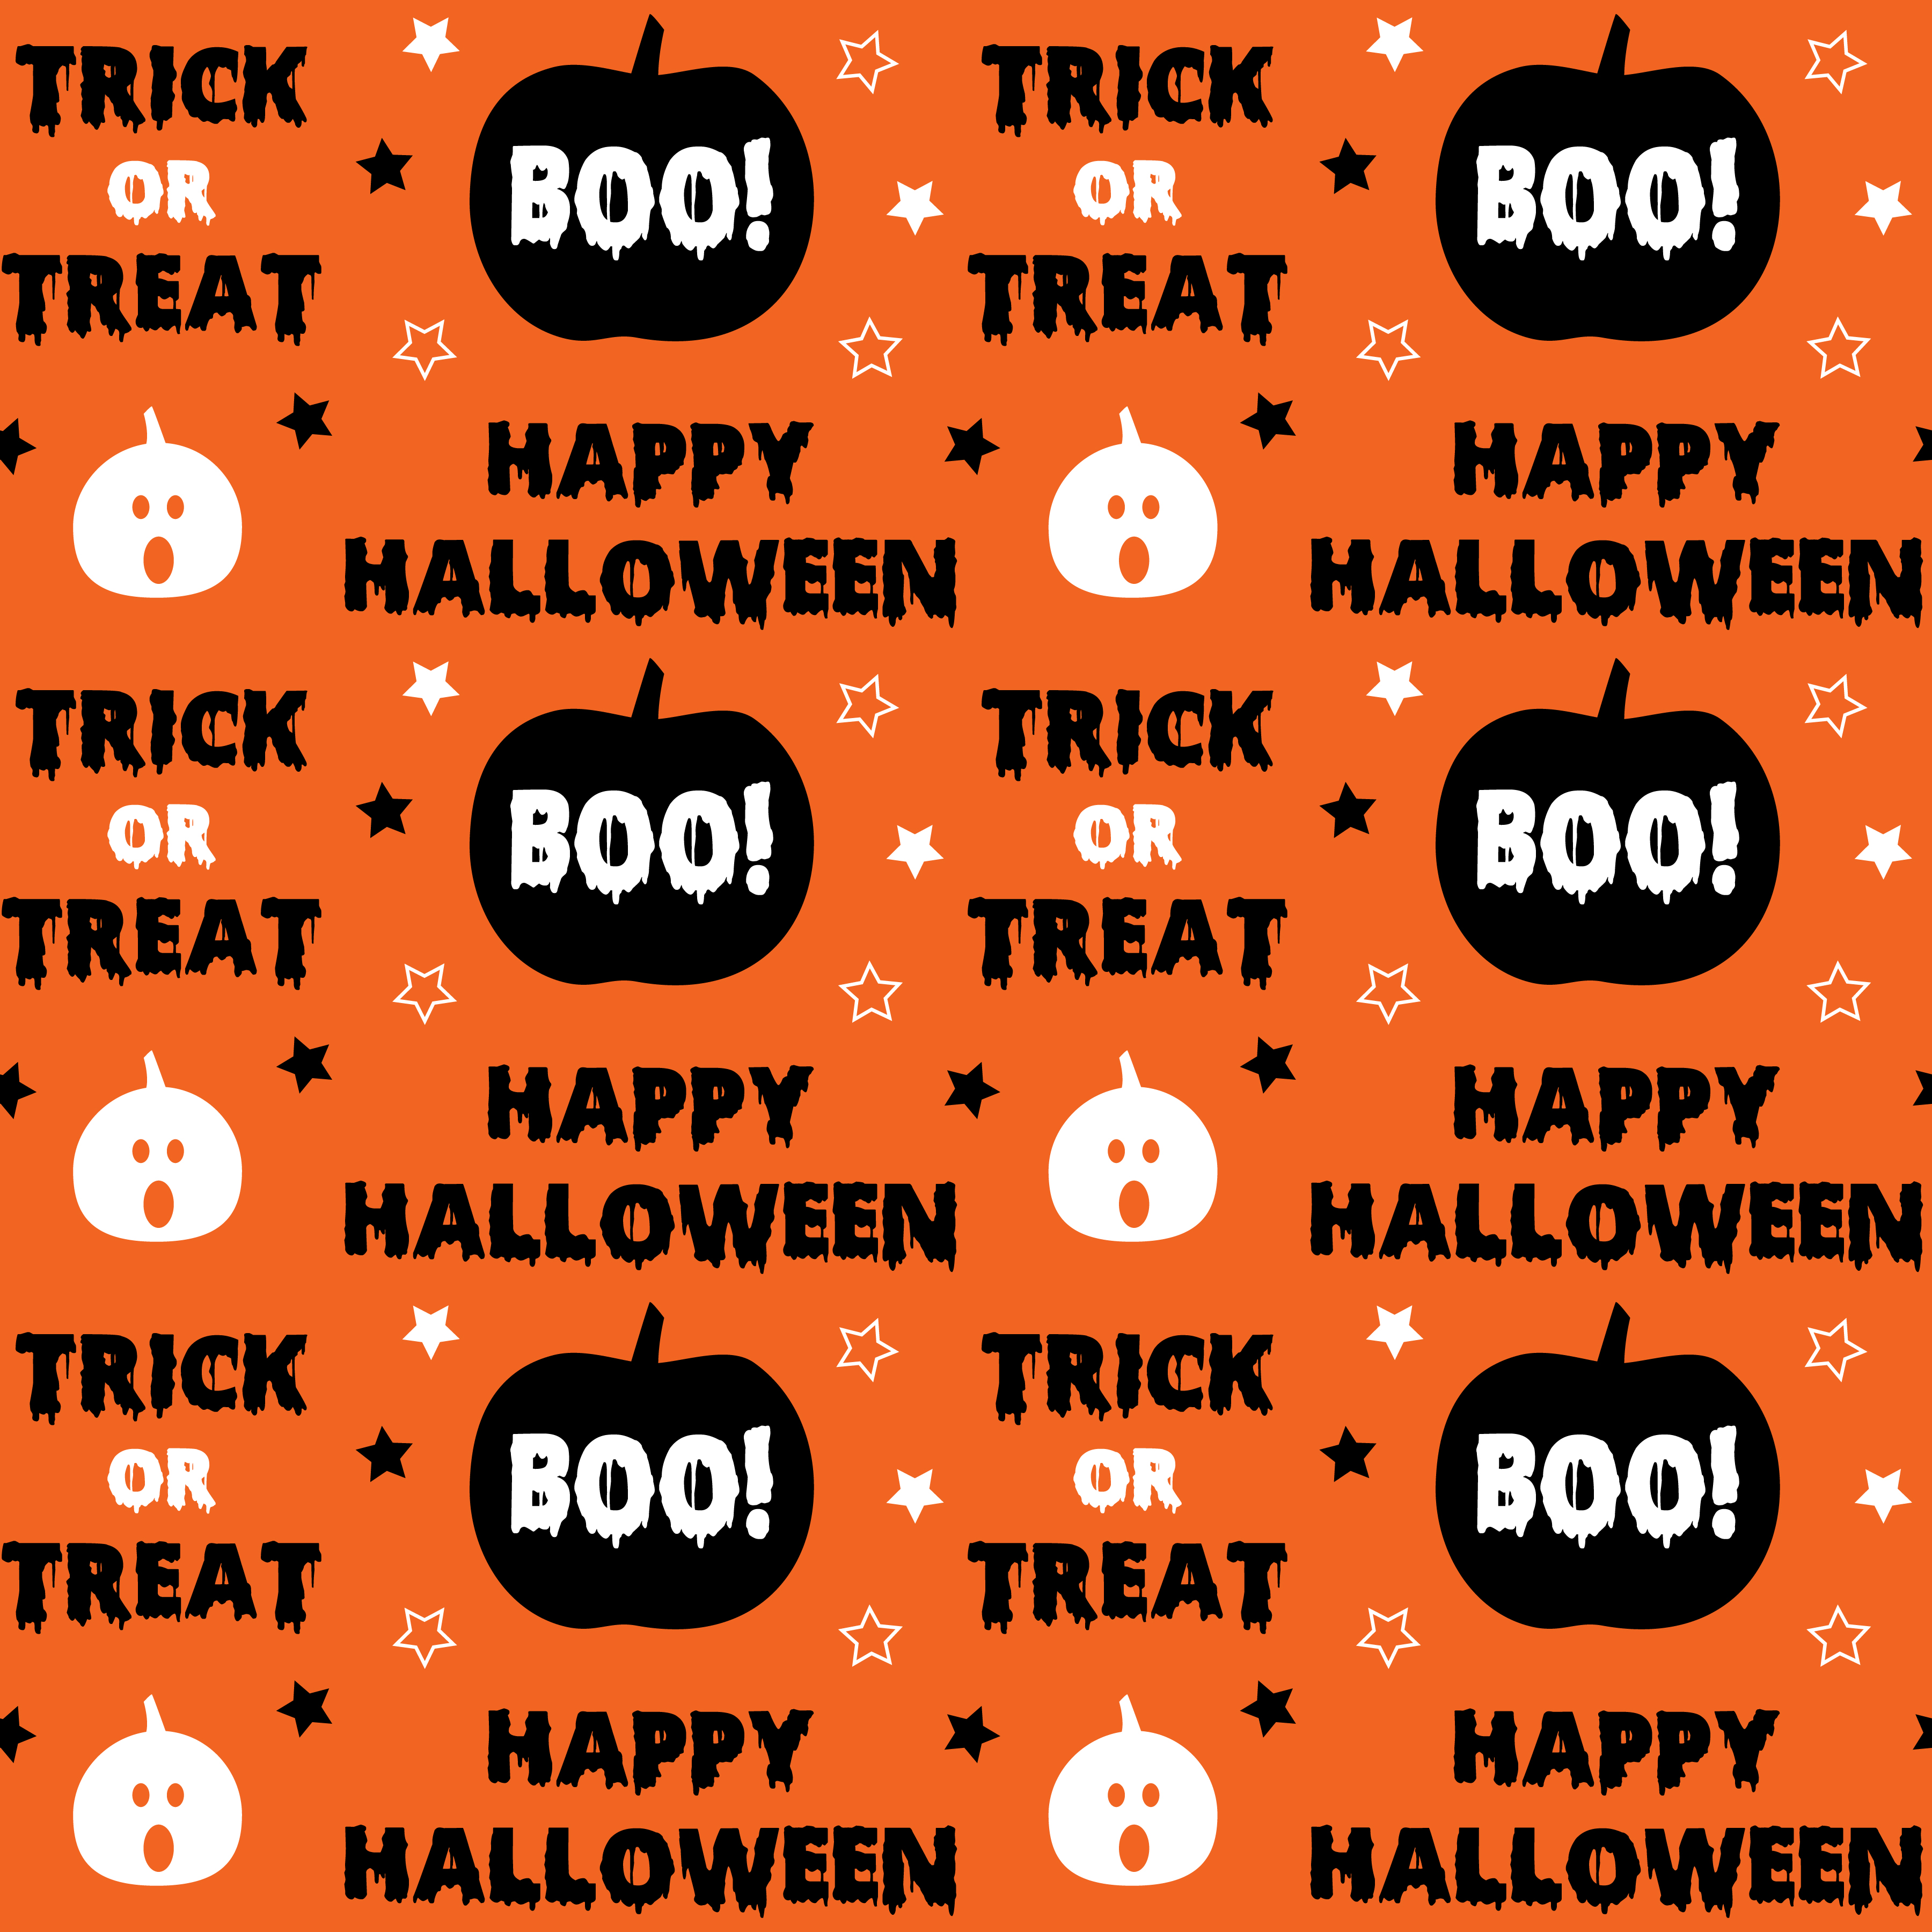 Happy Halloween Lettering With Pumpkin Seamless Pattern Download Free Vectors Clipart Graphics Vector Art